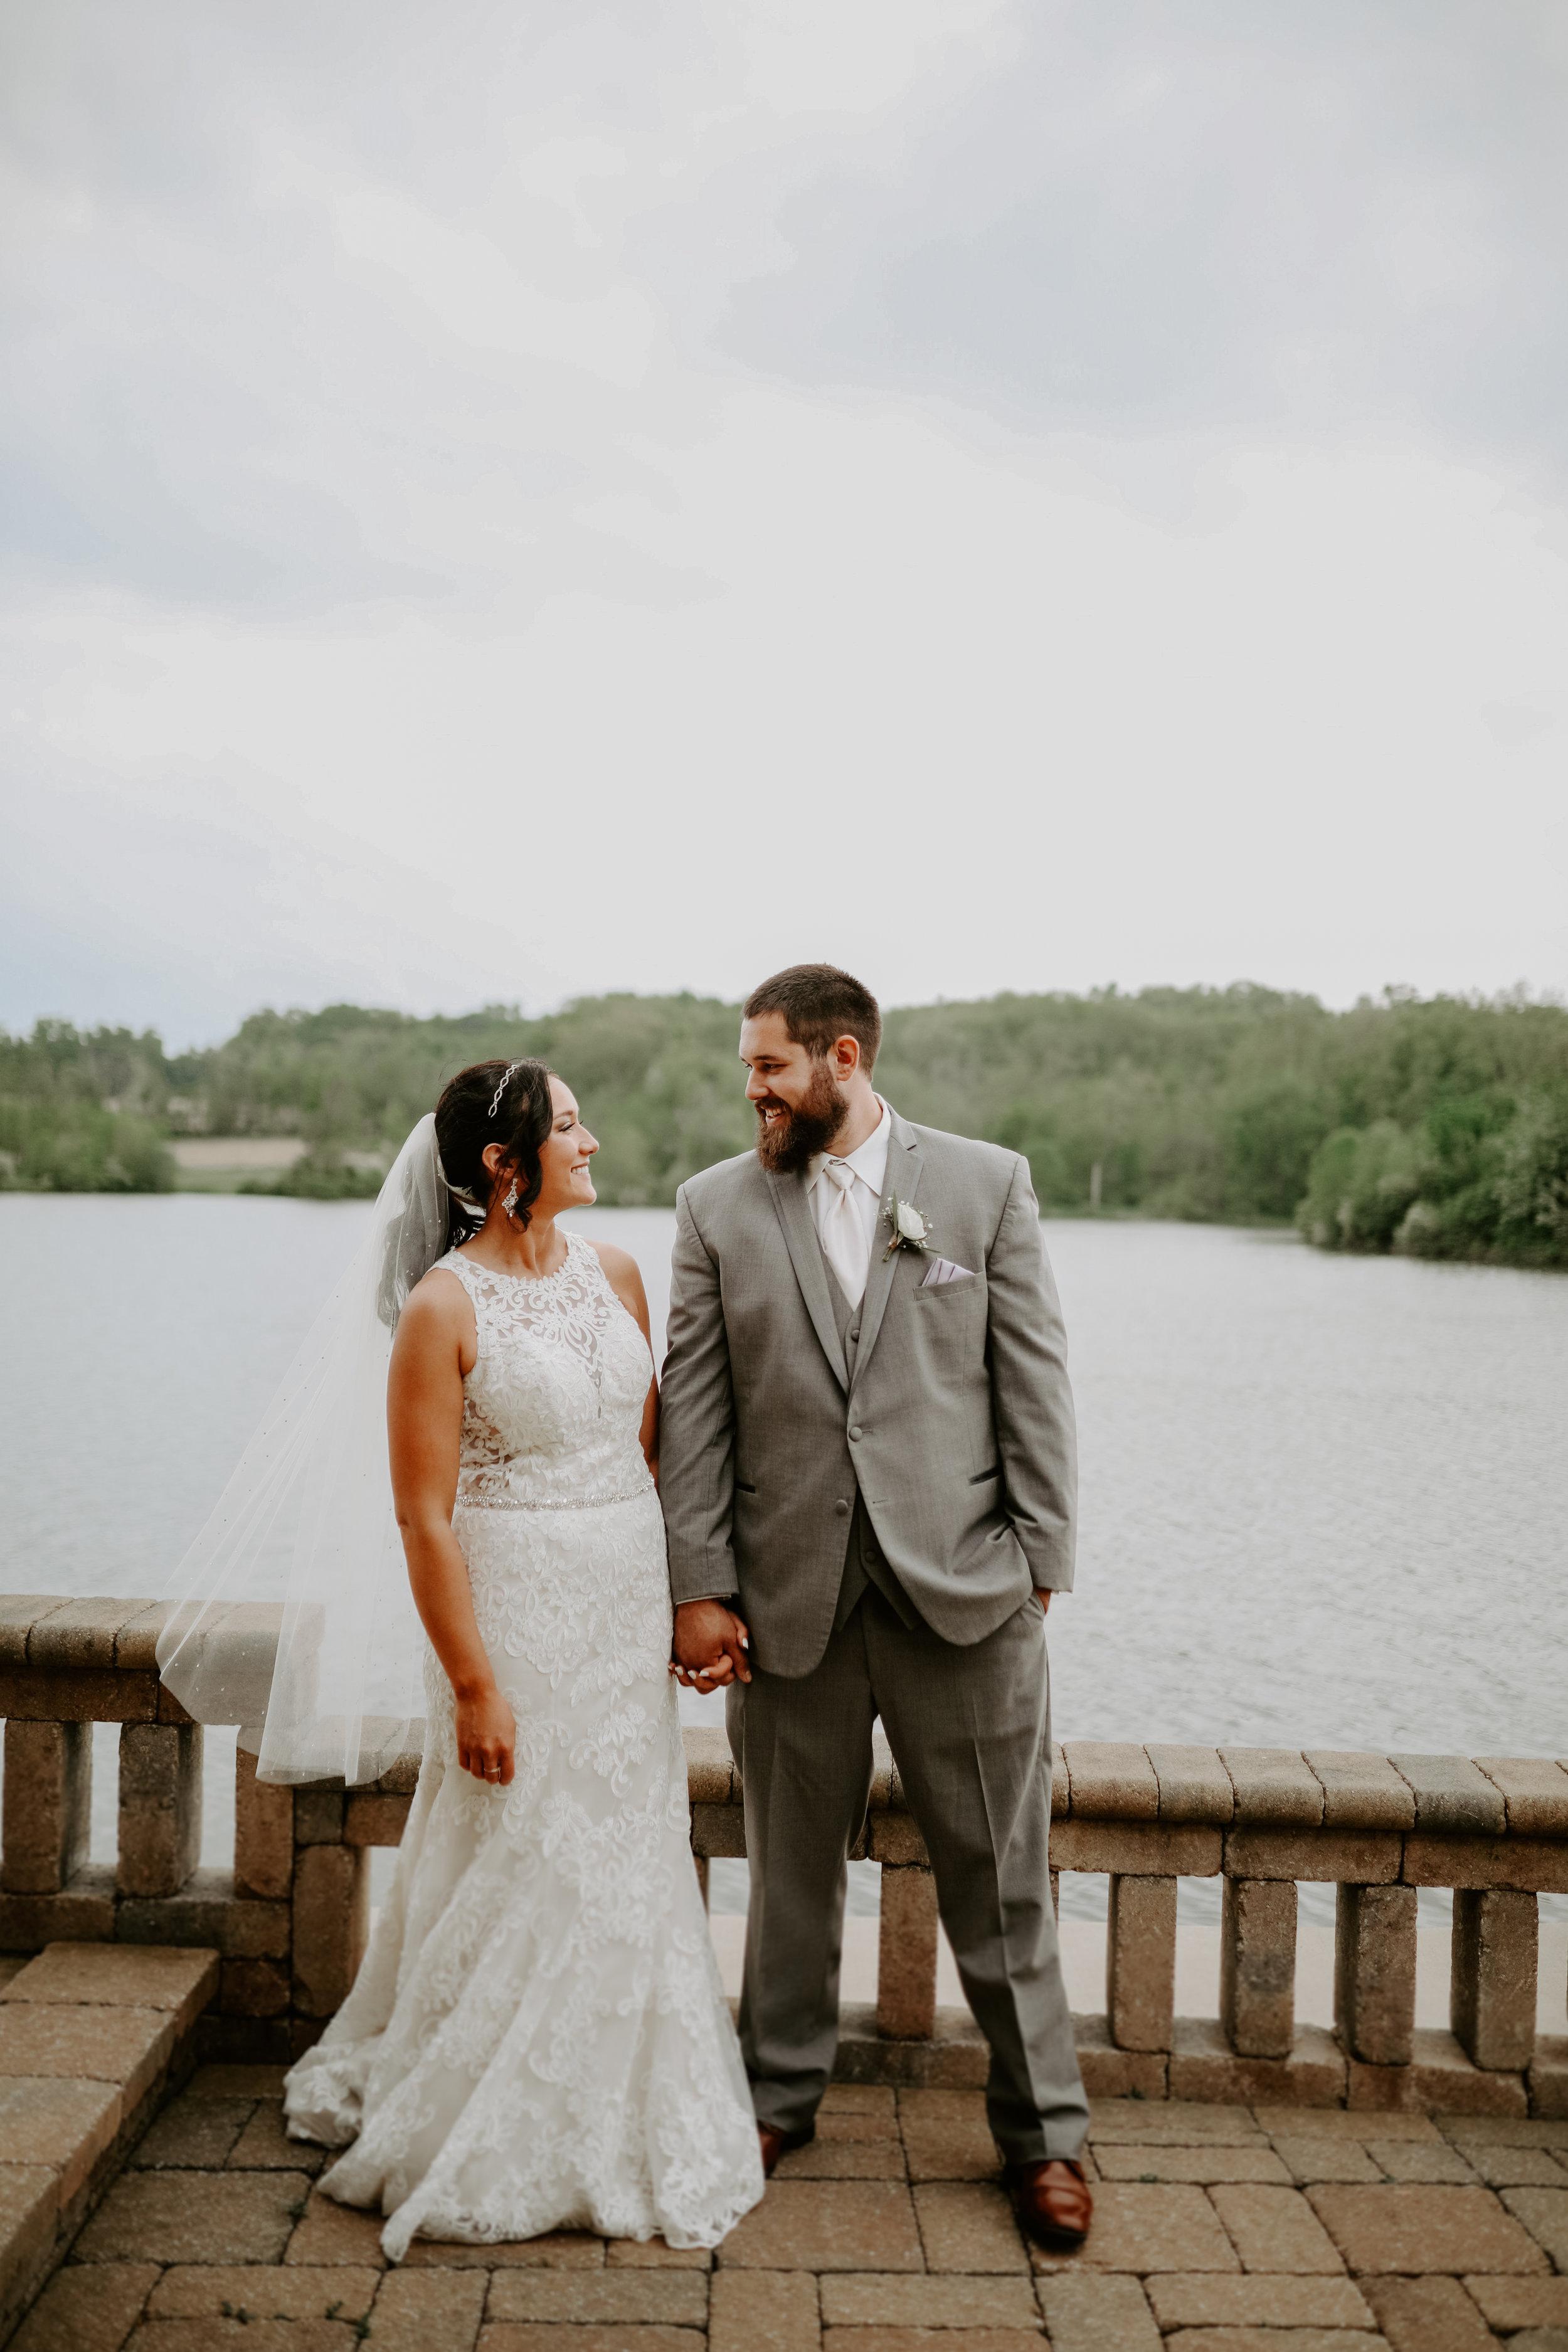 Kylei + Jordan wedding 277 (1 of 1).jpg